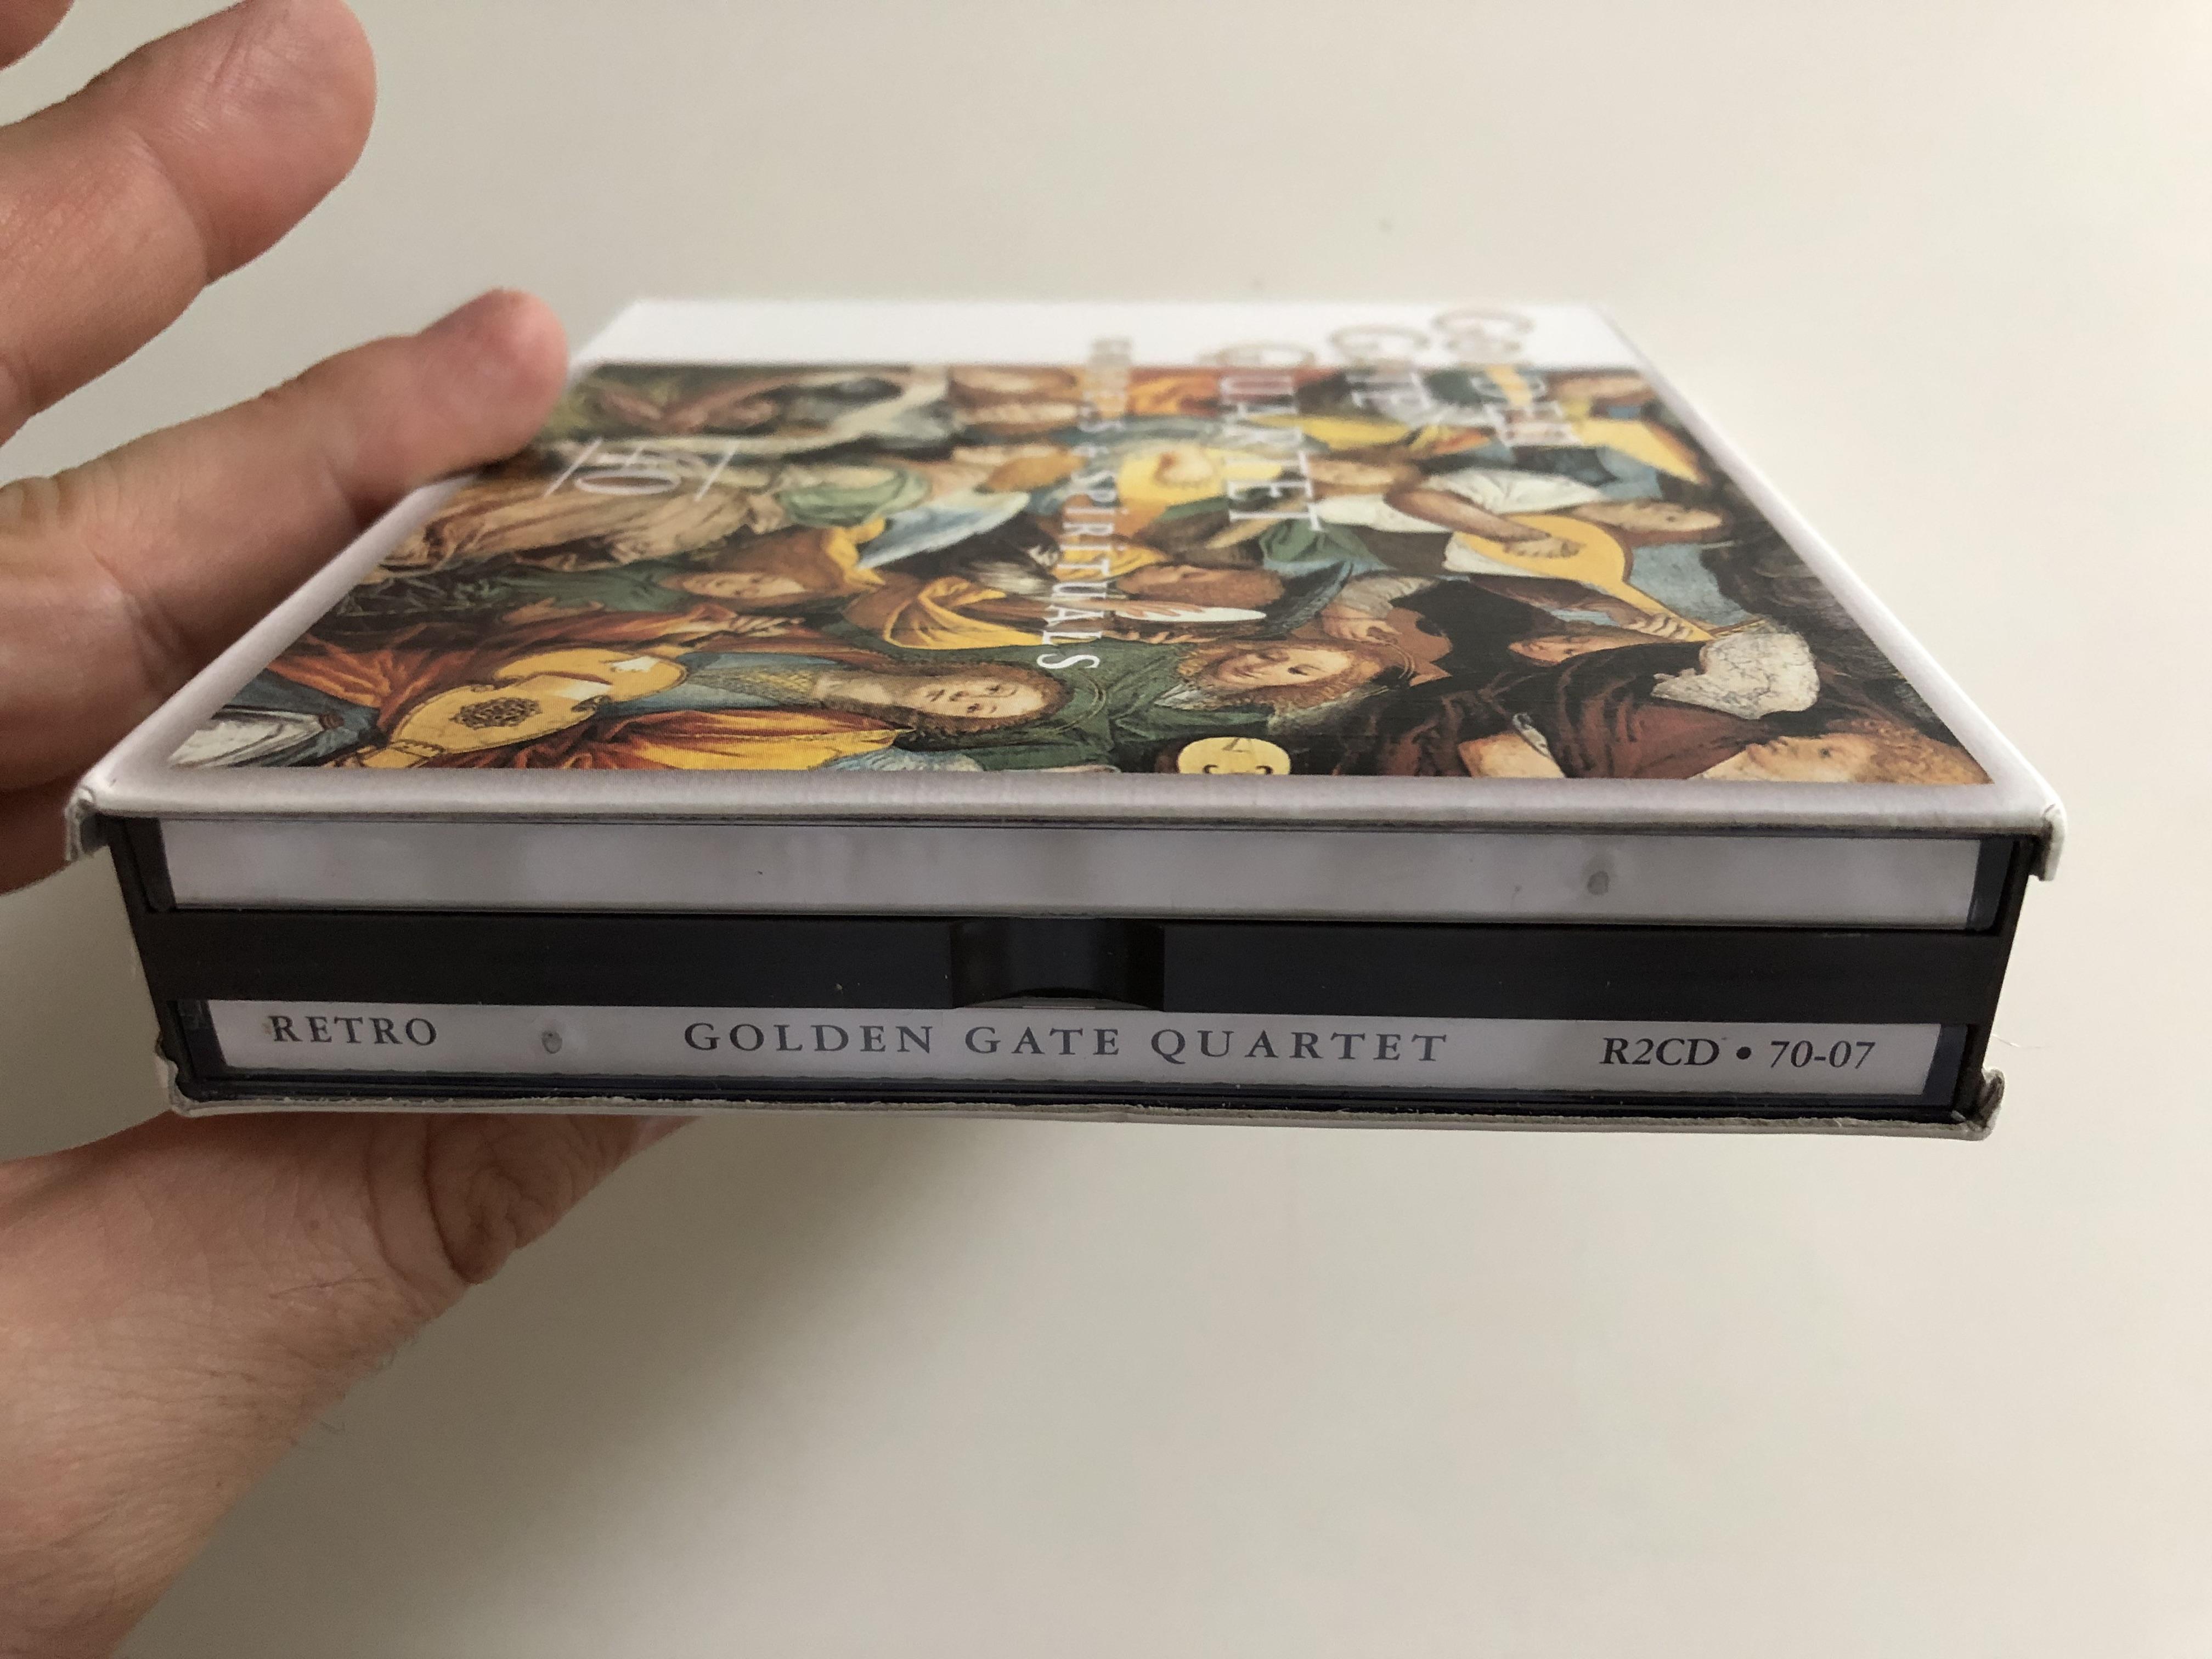 golden-gate-quartet-gospels-spirituals-the-gold-collection-40-r2cd-70-07-audio-cd-set-4-.jpg